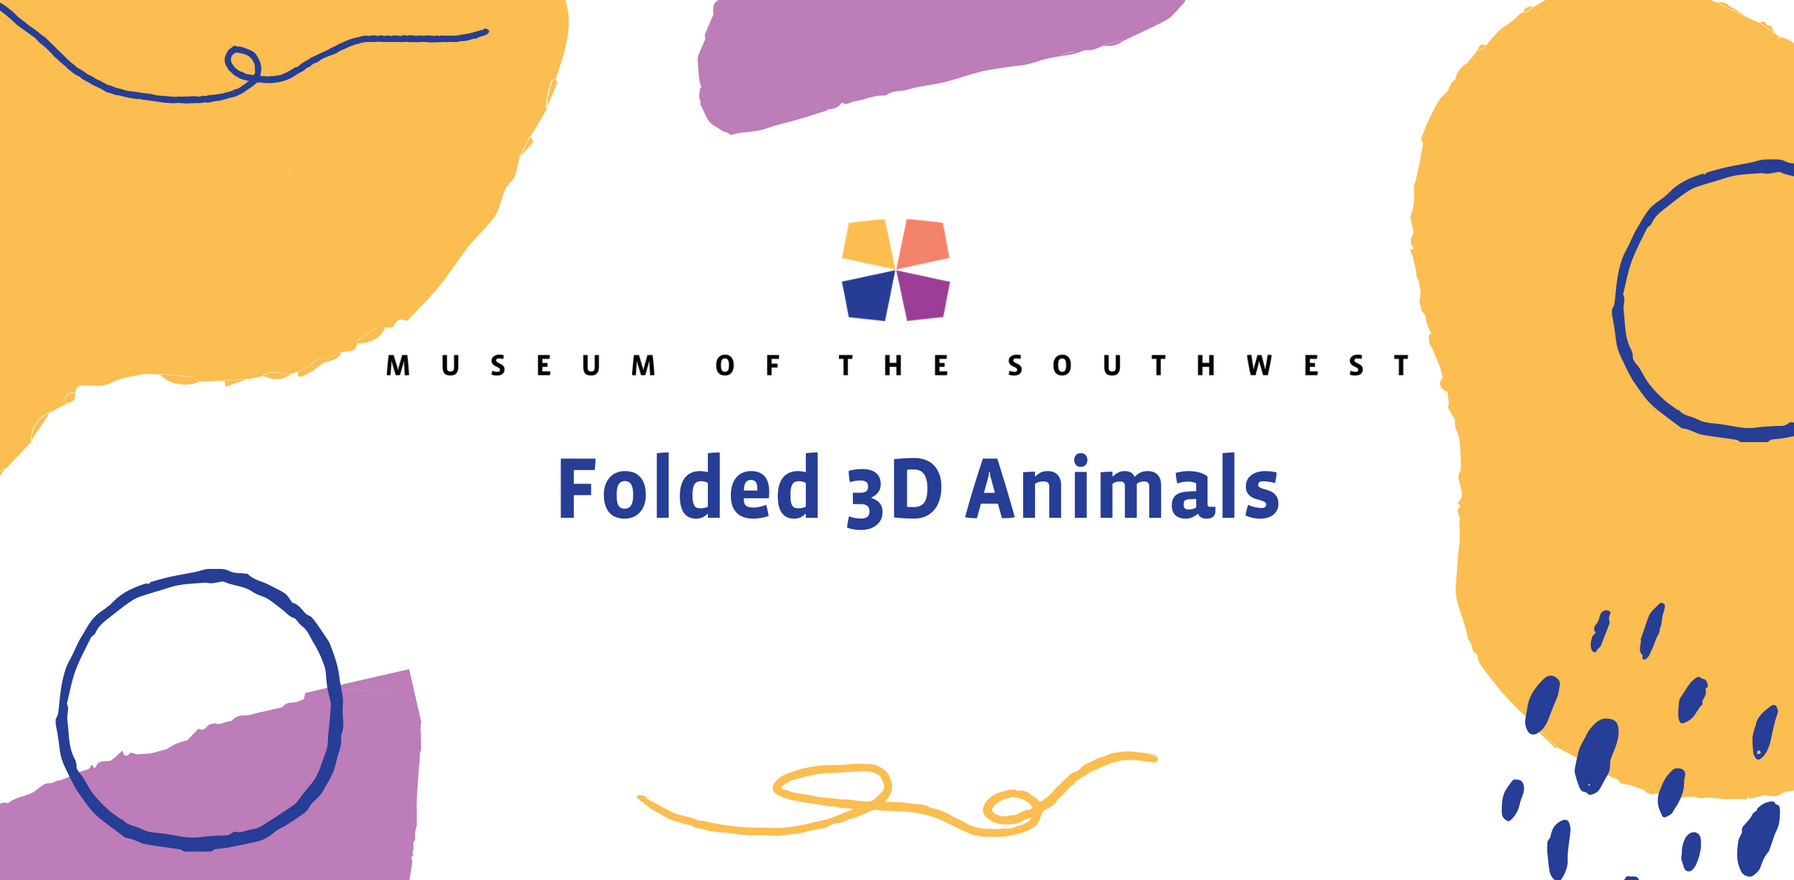 Folded 3D Animals